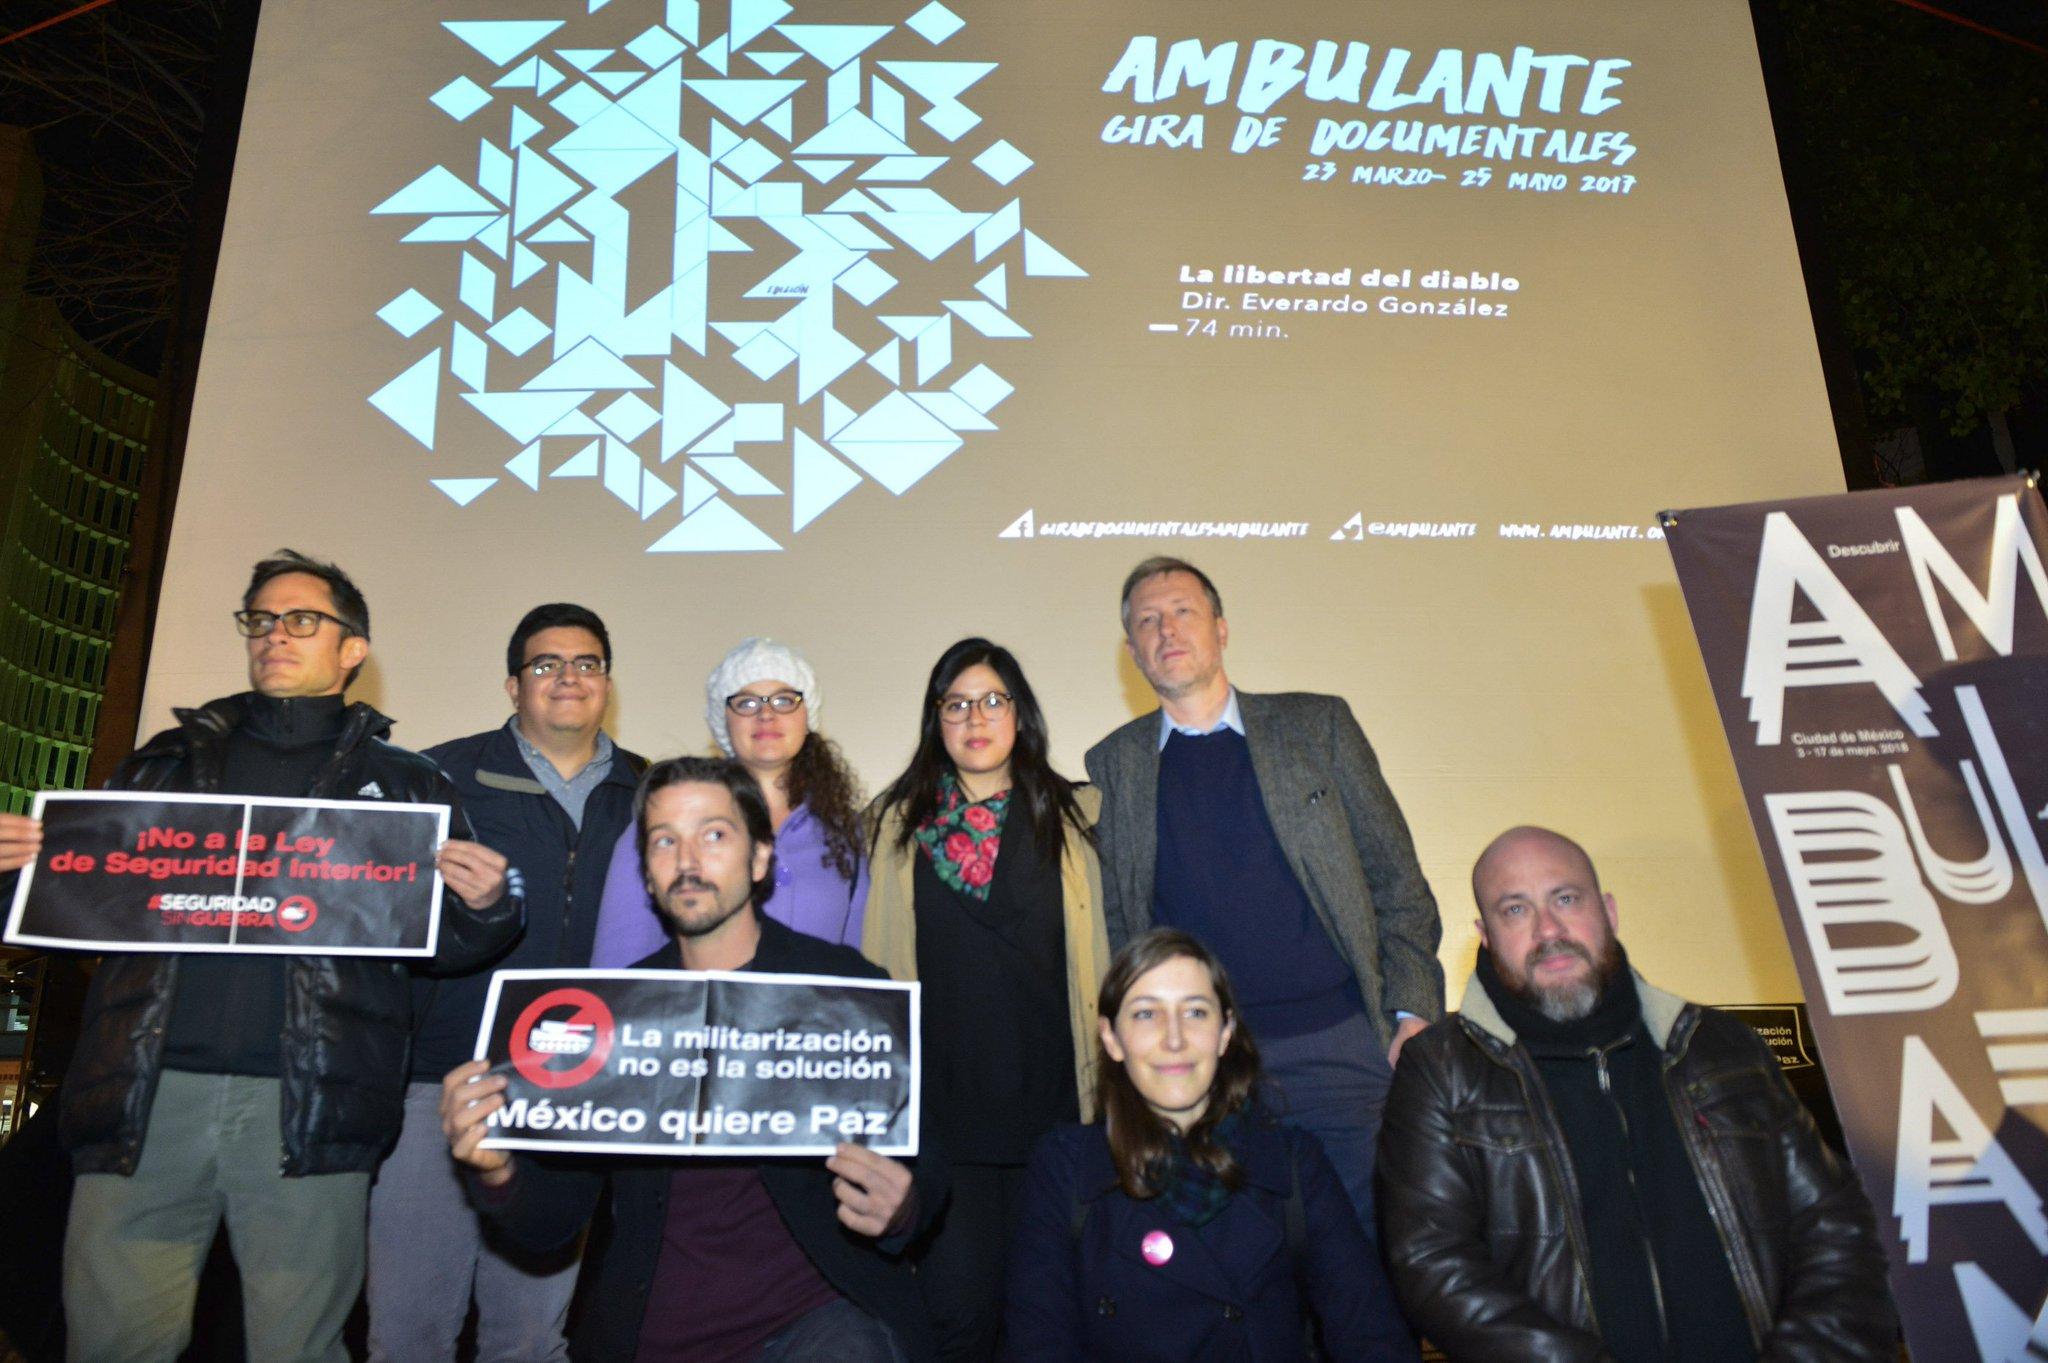 ▶️ @diegoluna_ y @GaelGarciaB piden a @EPN vetar #LeydeSeguiridadInterior https://t.co/5nOcoaJezz https://t.co/uP3cVJWMDc